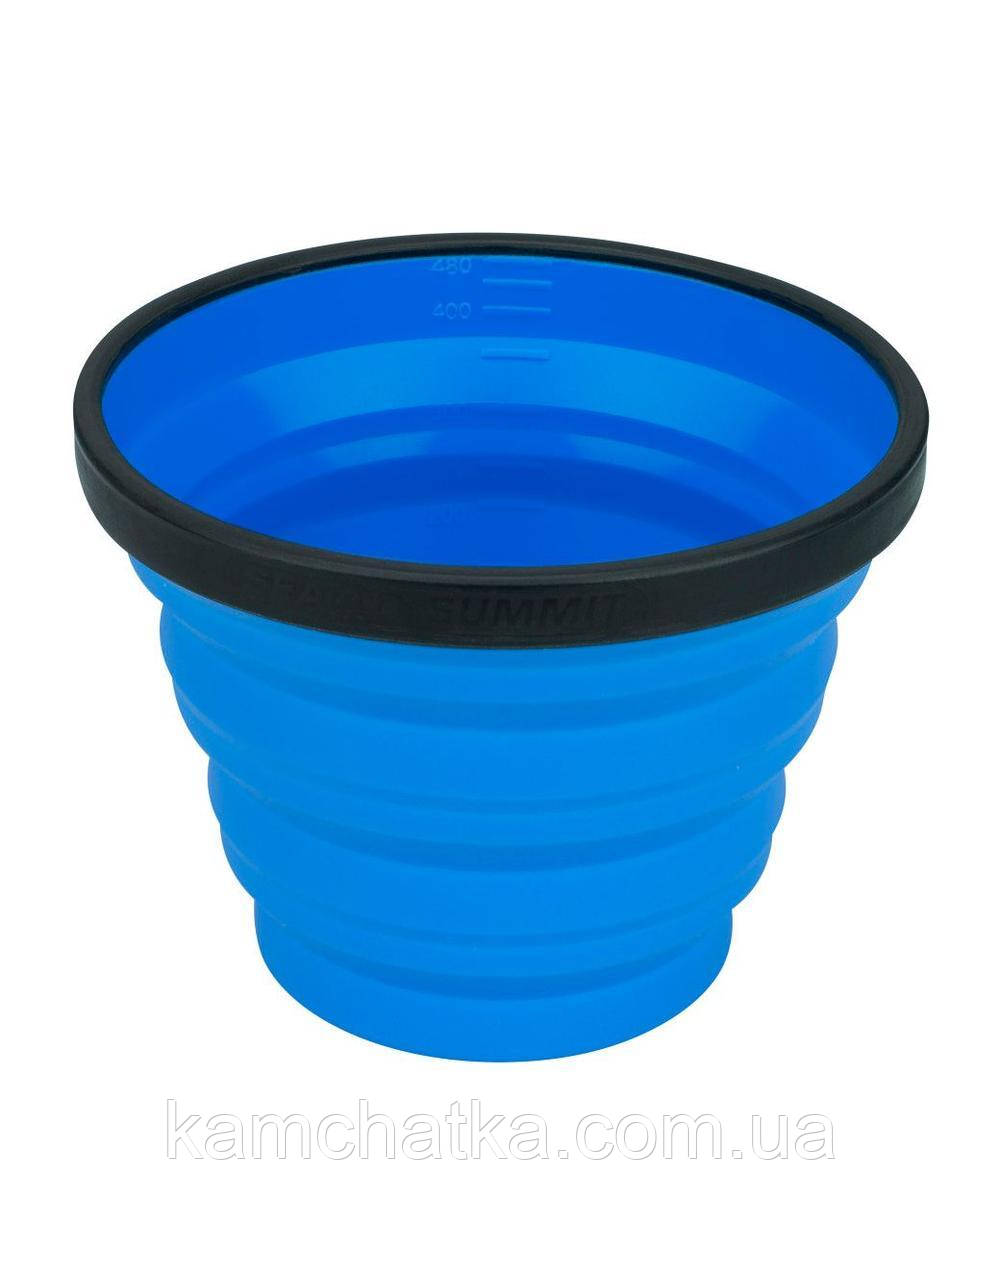 Чашка складная Sea to Summit X-Mug, 480 мл, Navy (STS AXMUGNB)